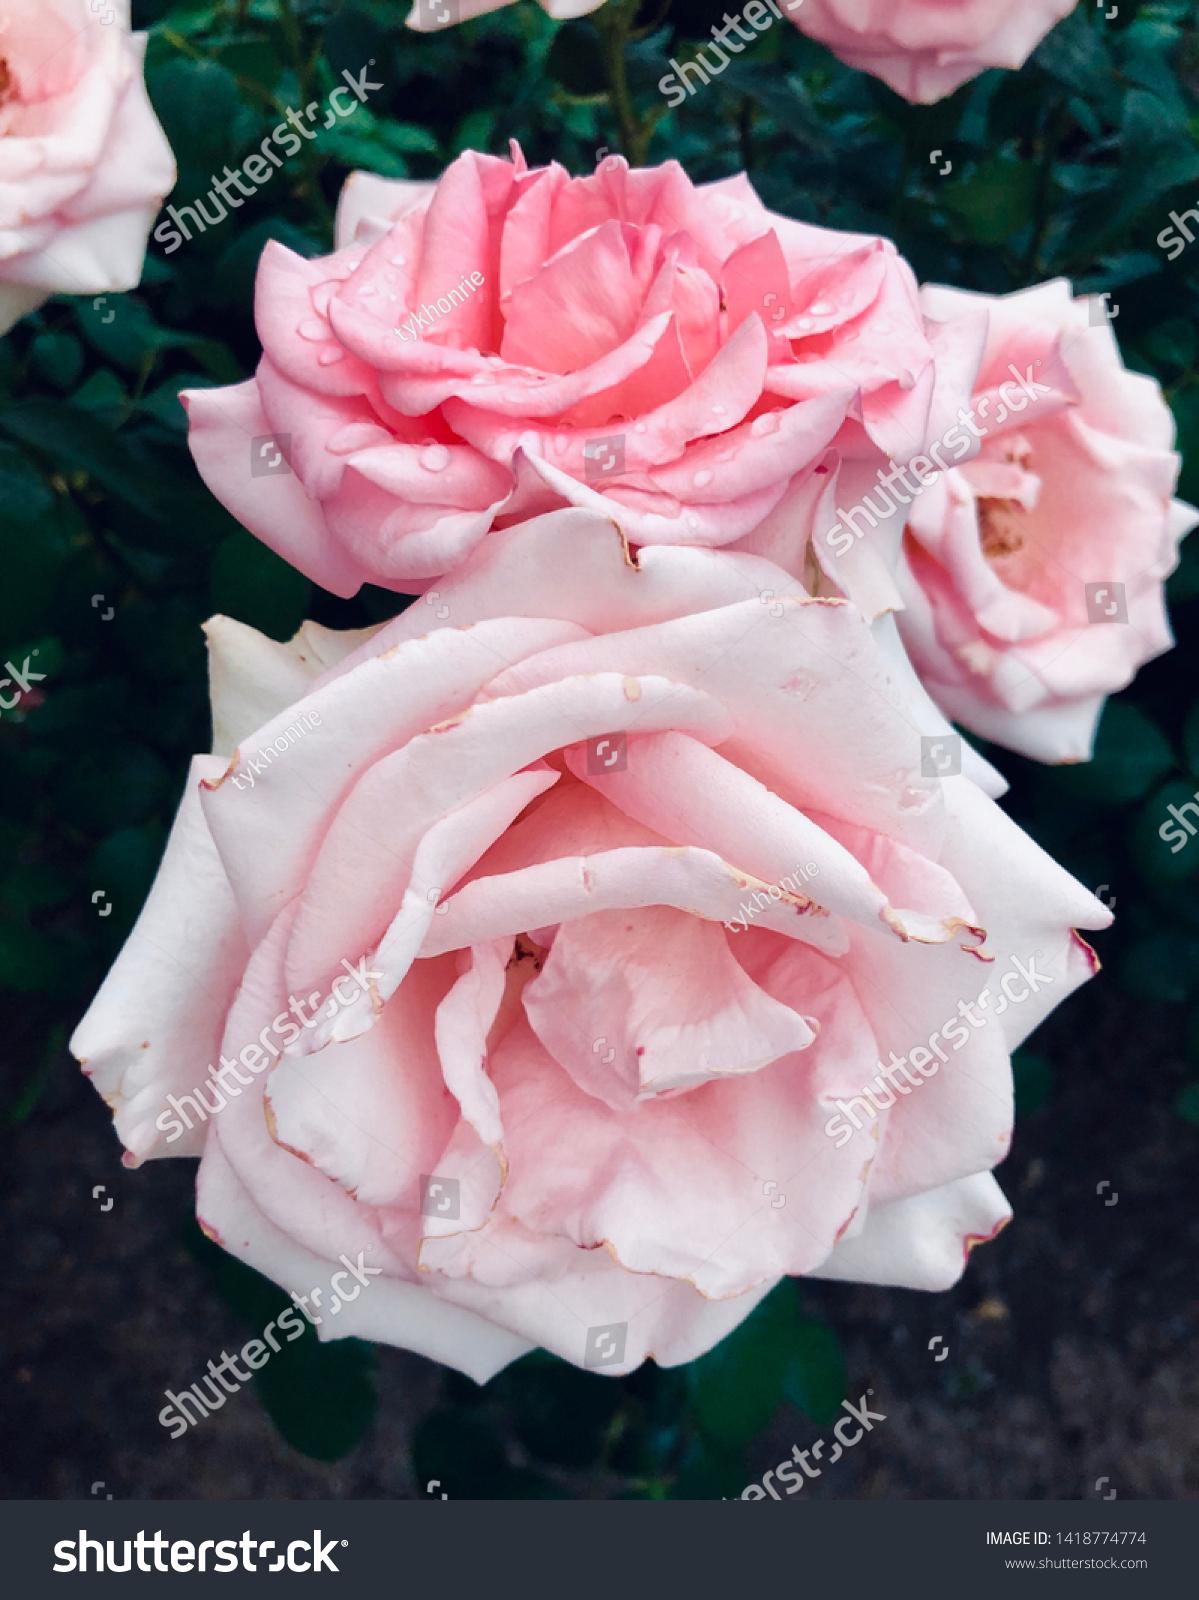 stock-photo-pink-rose-flower-pattern-pho